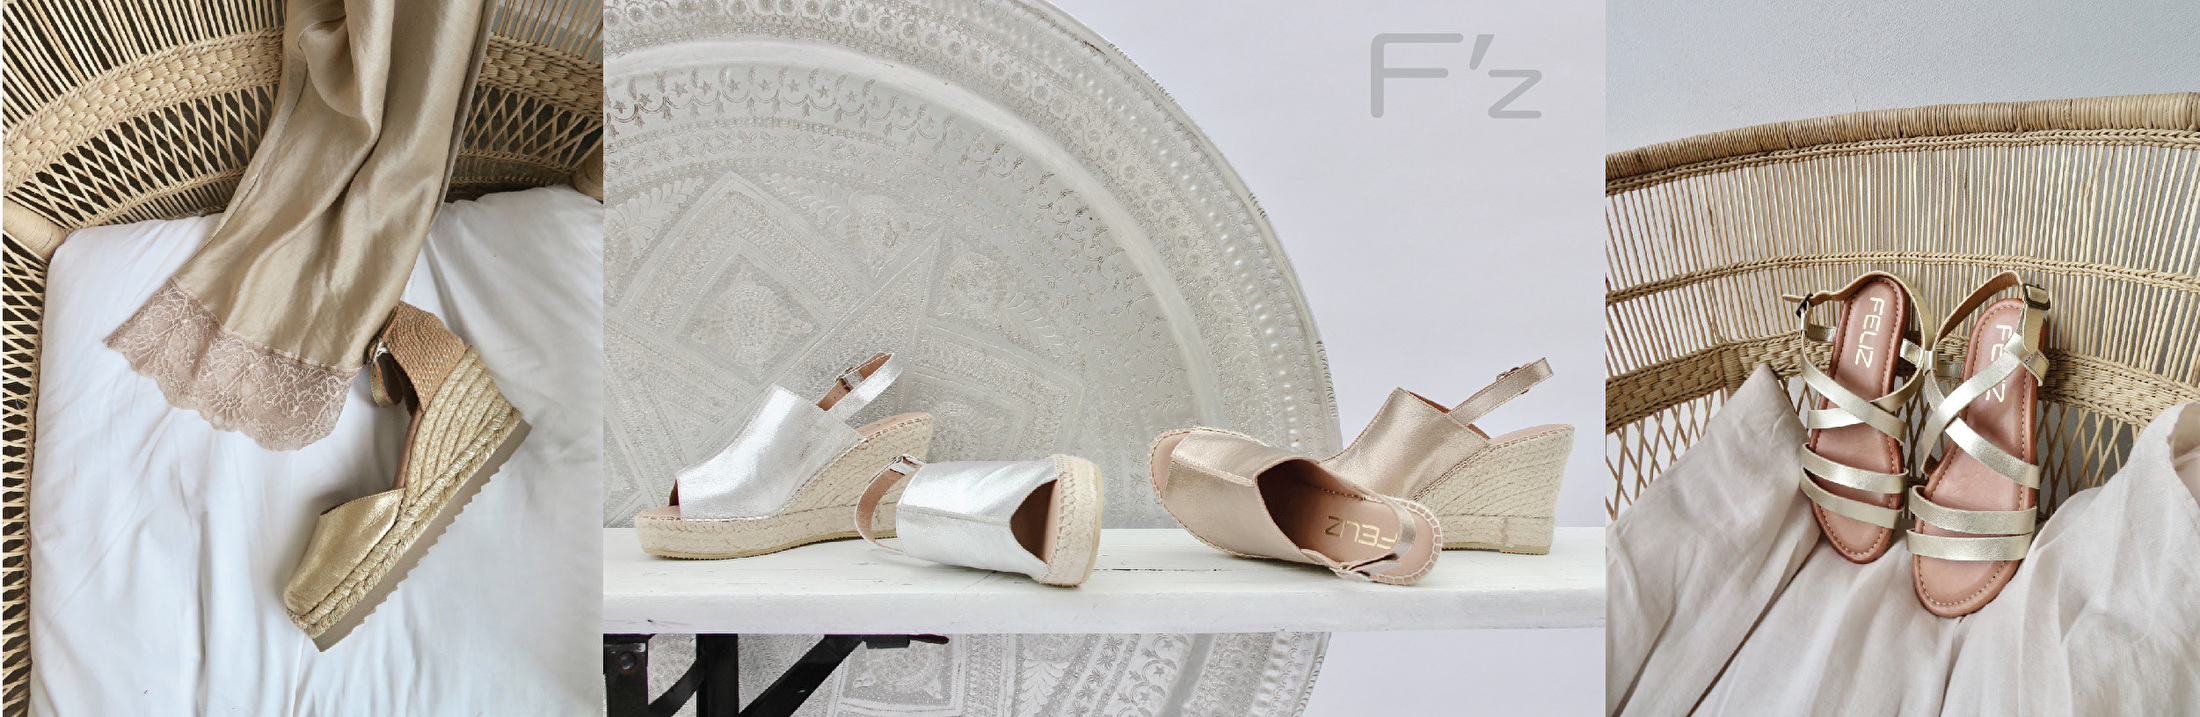 Summer 2020 espadrilles slippes sandaal